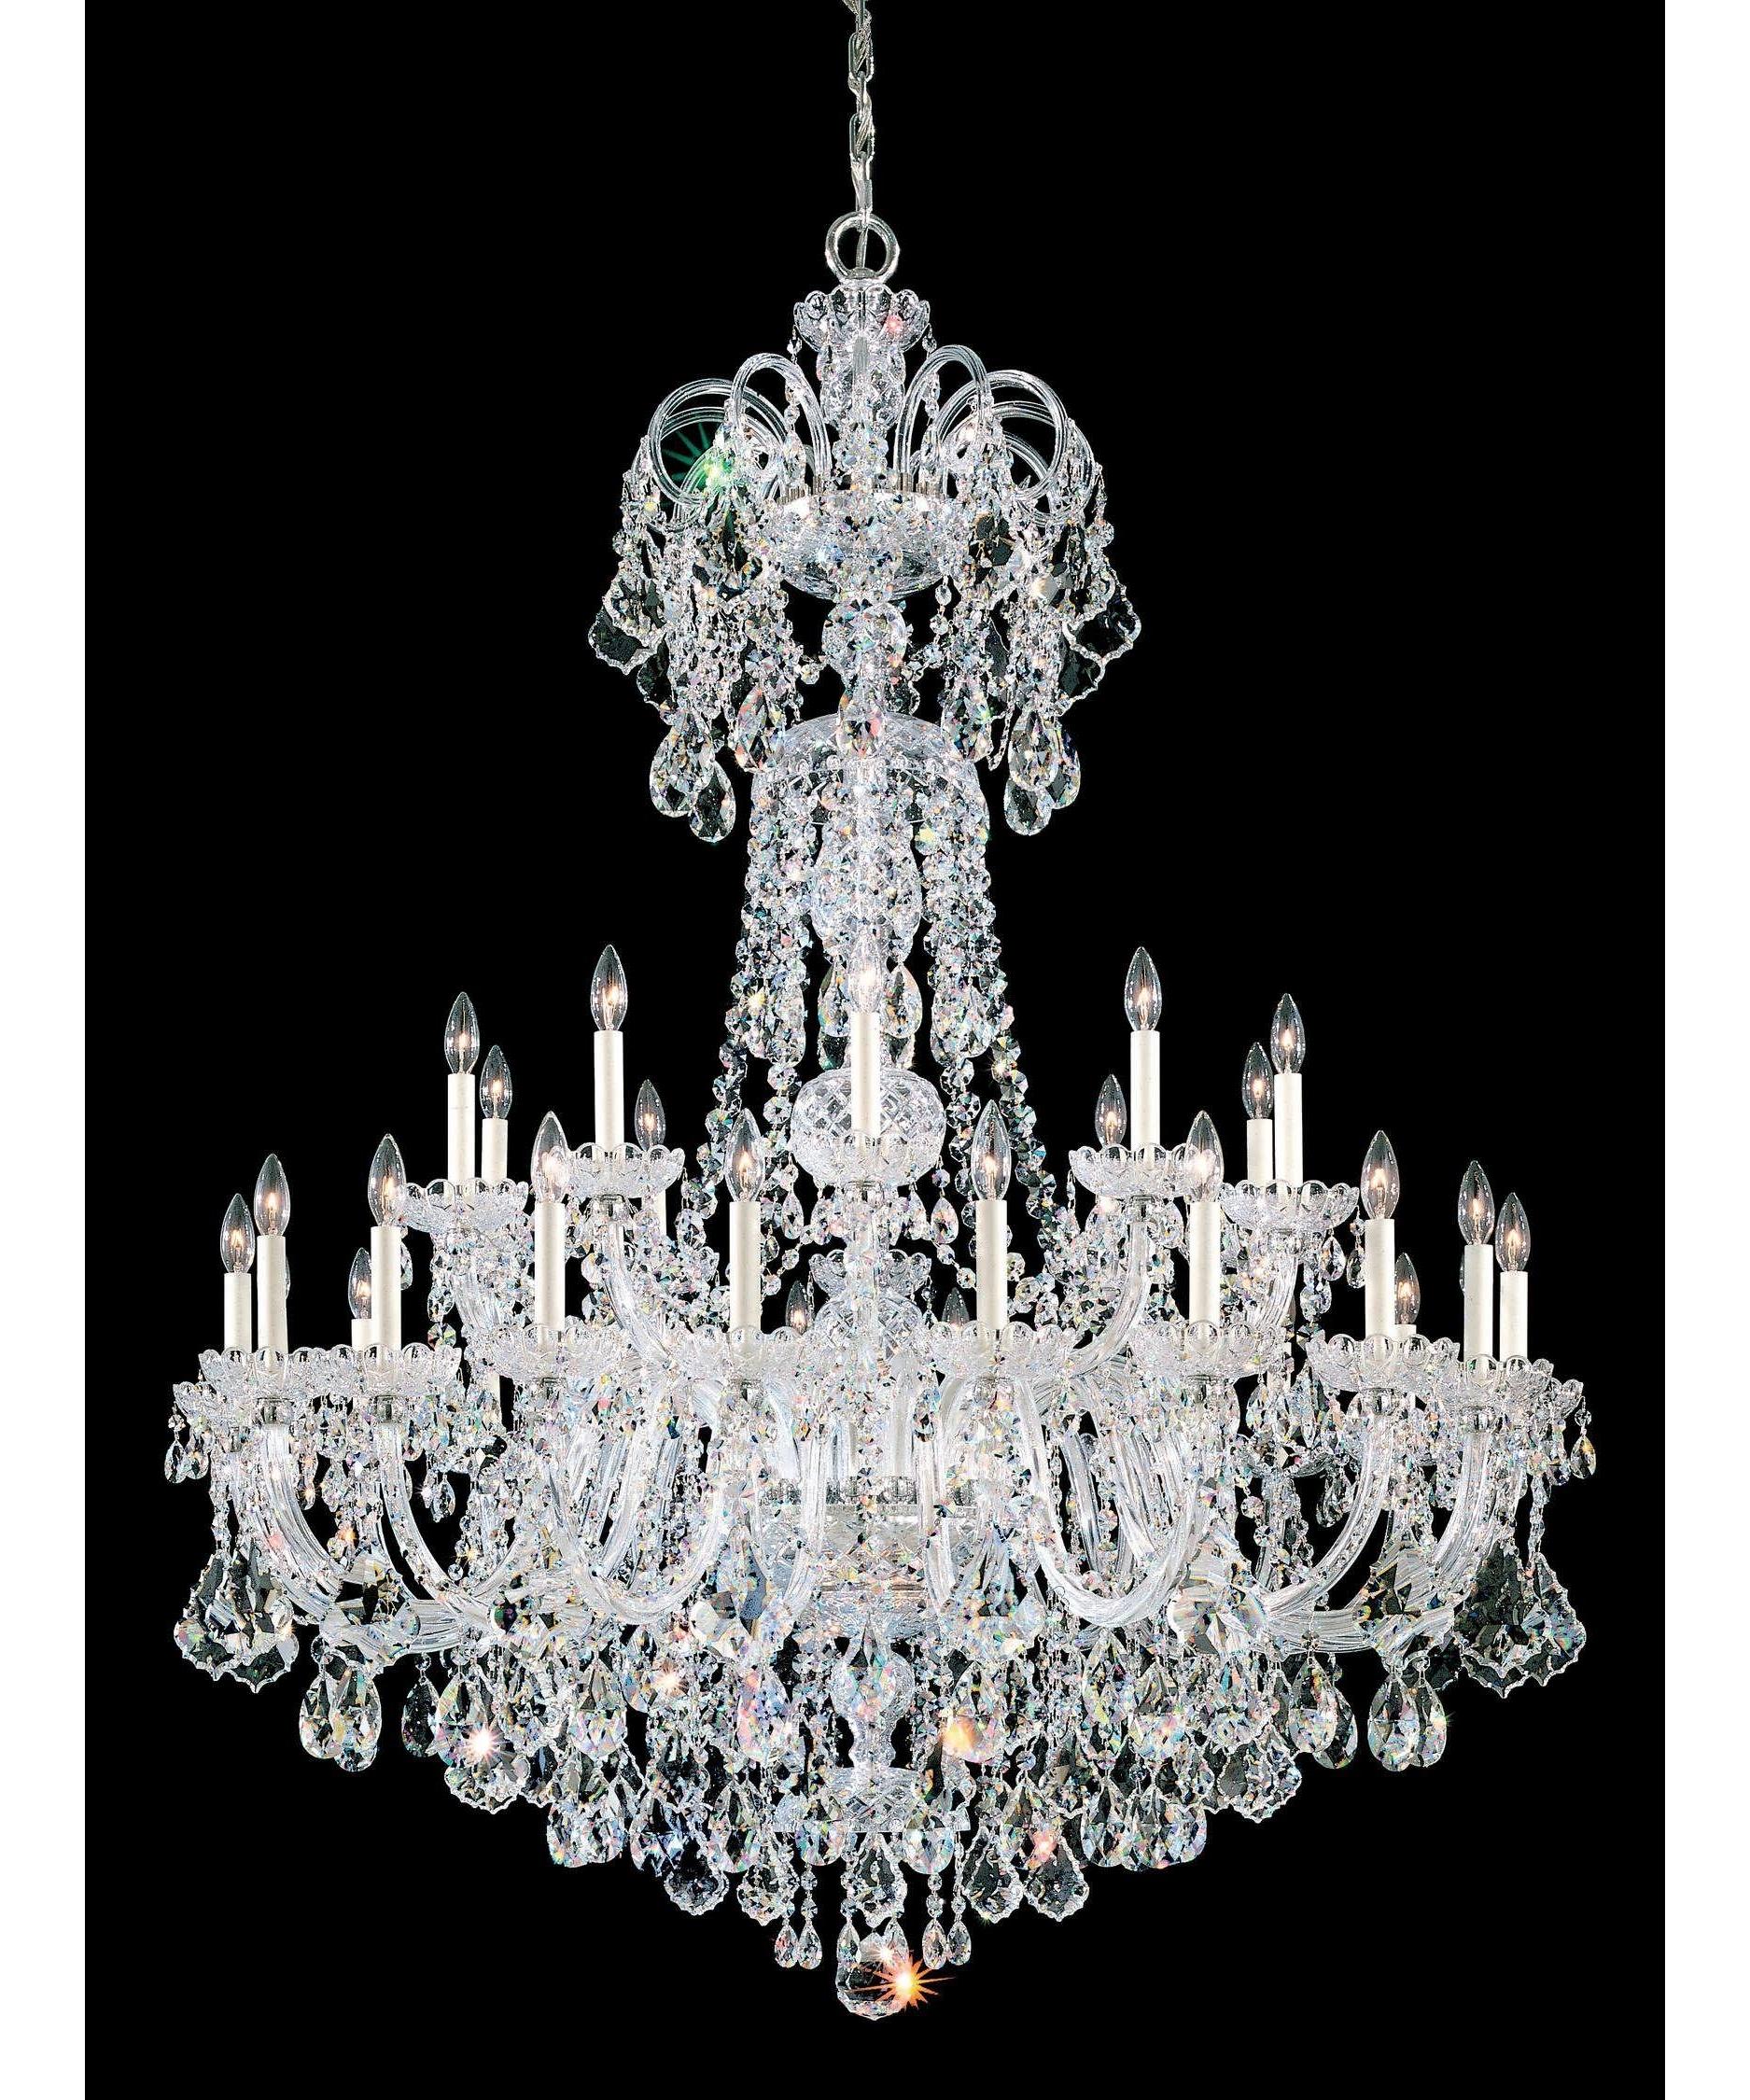 Preferred Acrylic Chandelier Lighting Throughout Chandelier : Beach Chandelier Murano Glass Chandelier Italian (View 15 of 20)